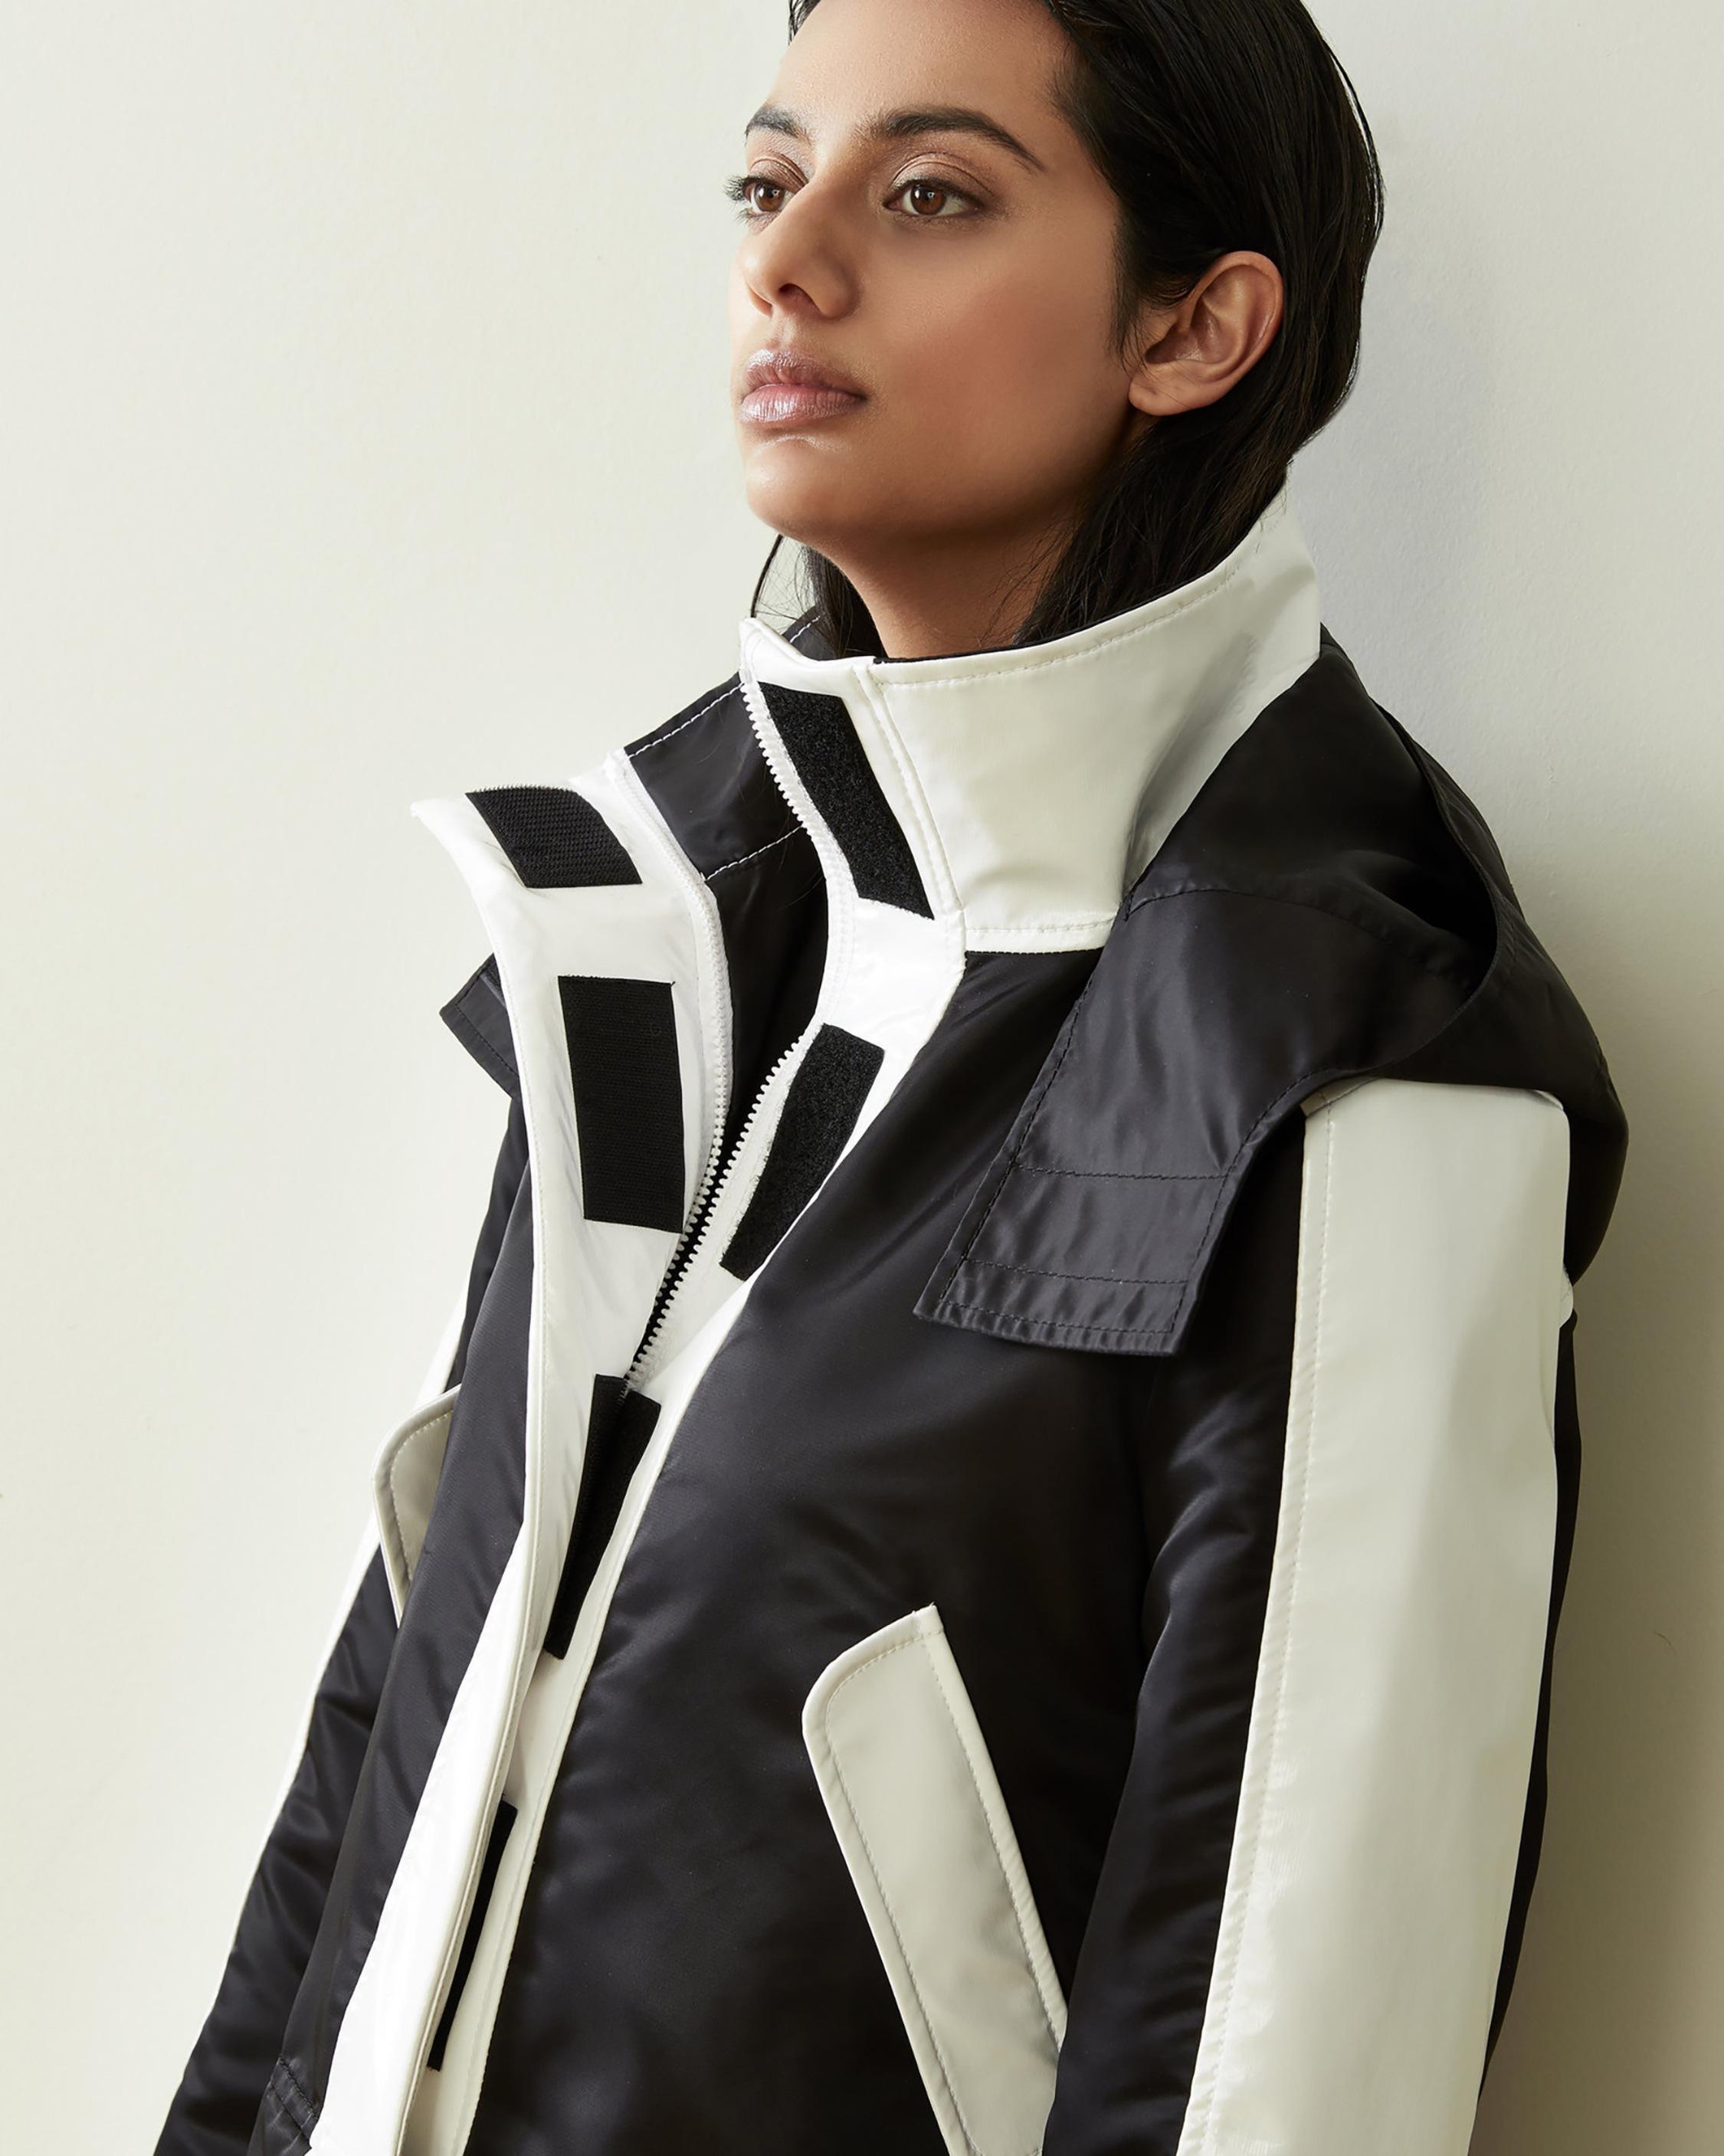 CAALO Convertible Sustainable Raincoat 2